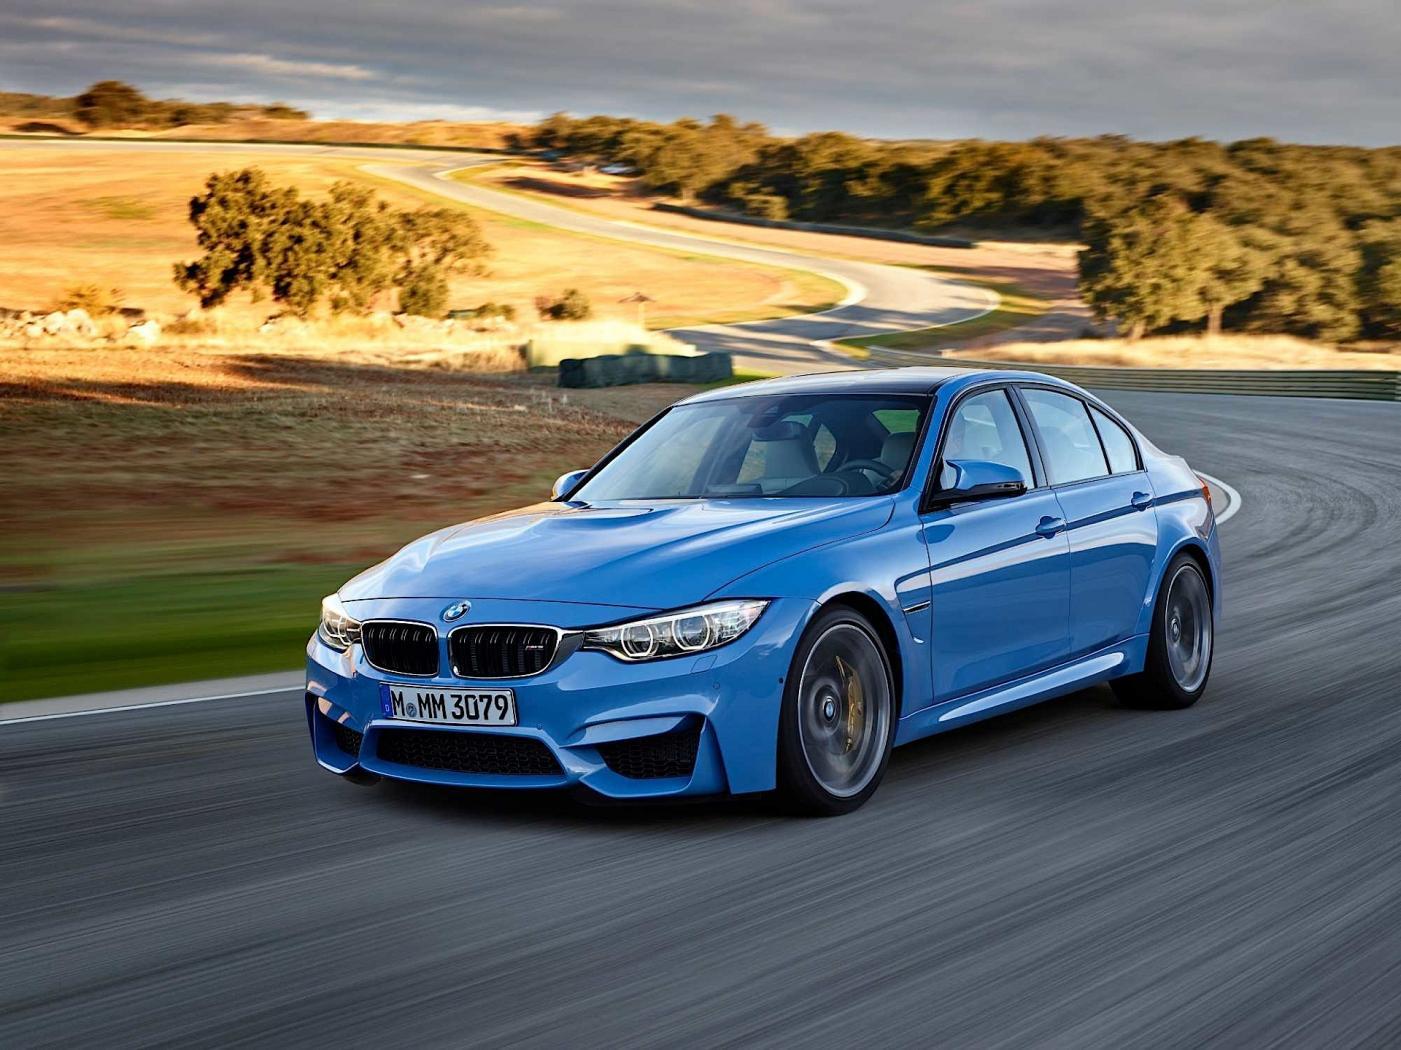 Moteurs-BMW-six-cylindres-en-ligne-12.jpeg